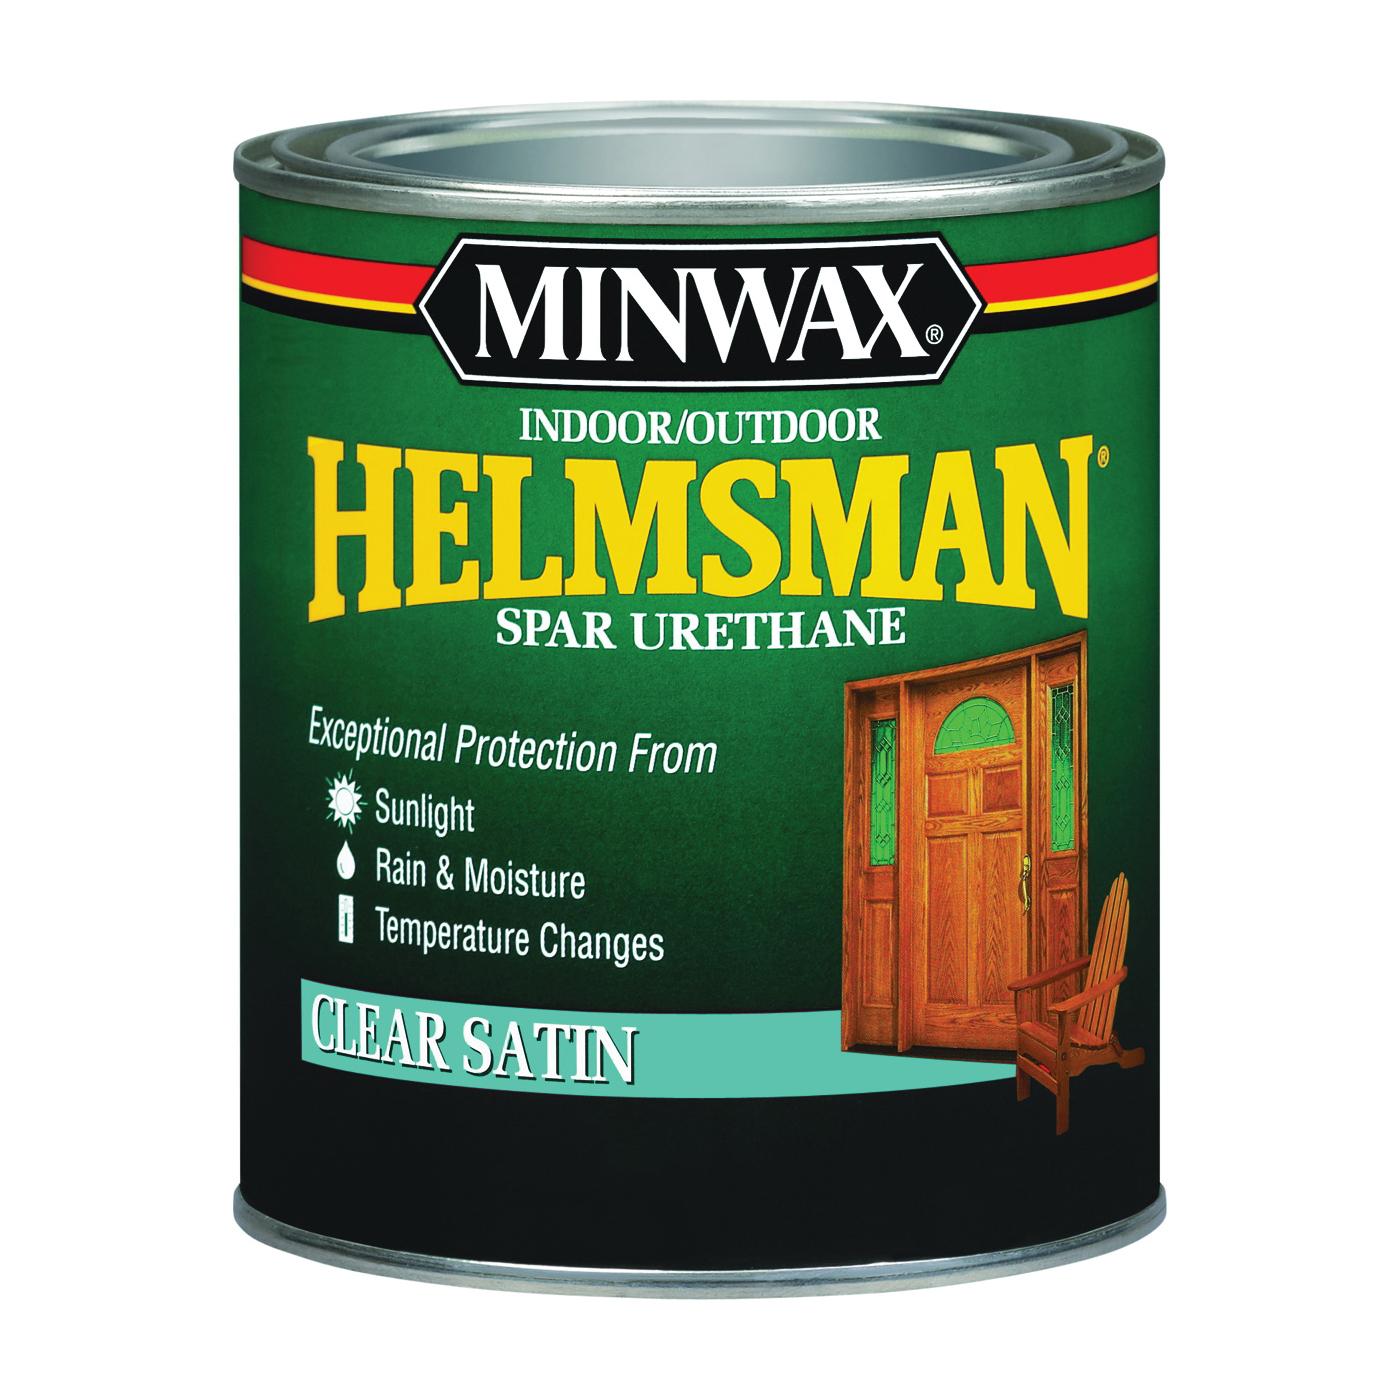 Picture of Minwax Helmsman 43205000 Spar Urethane Paint, Satin, Clear, Liquid, 1 pt, Can